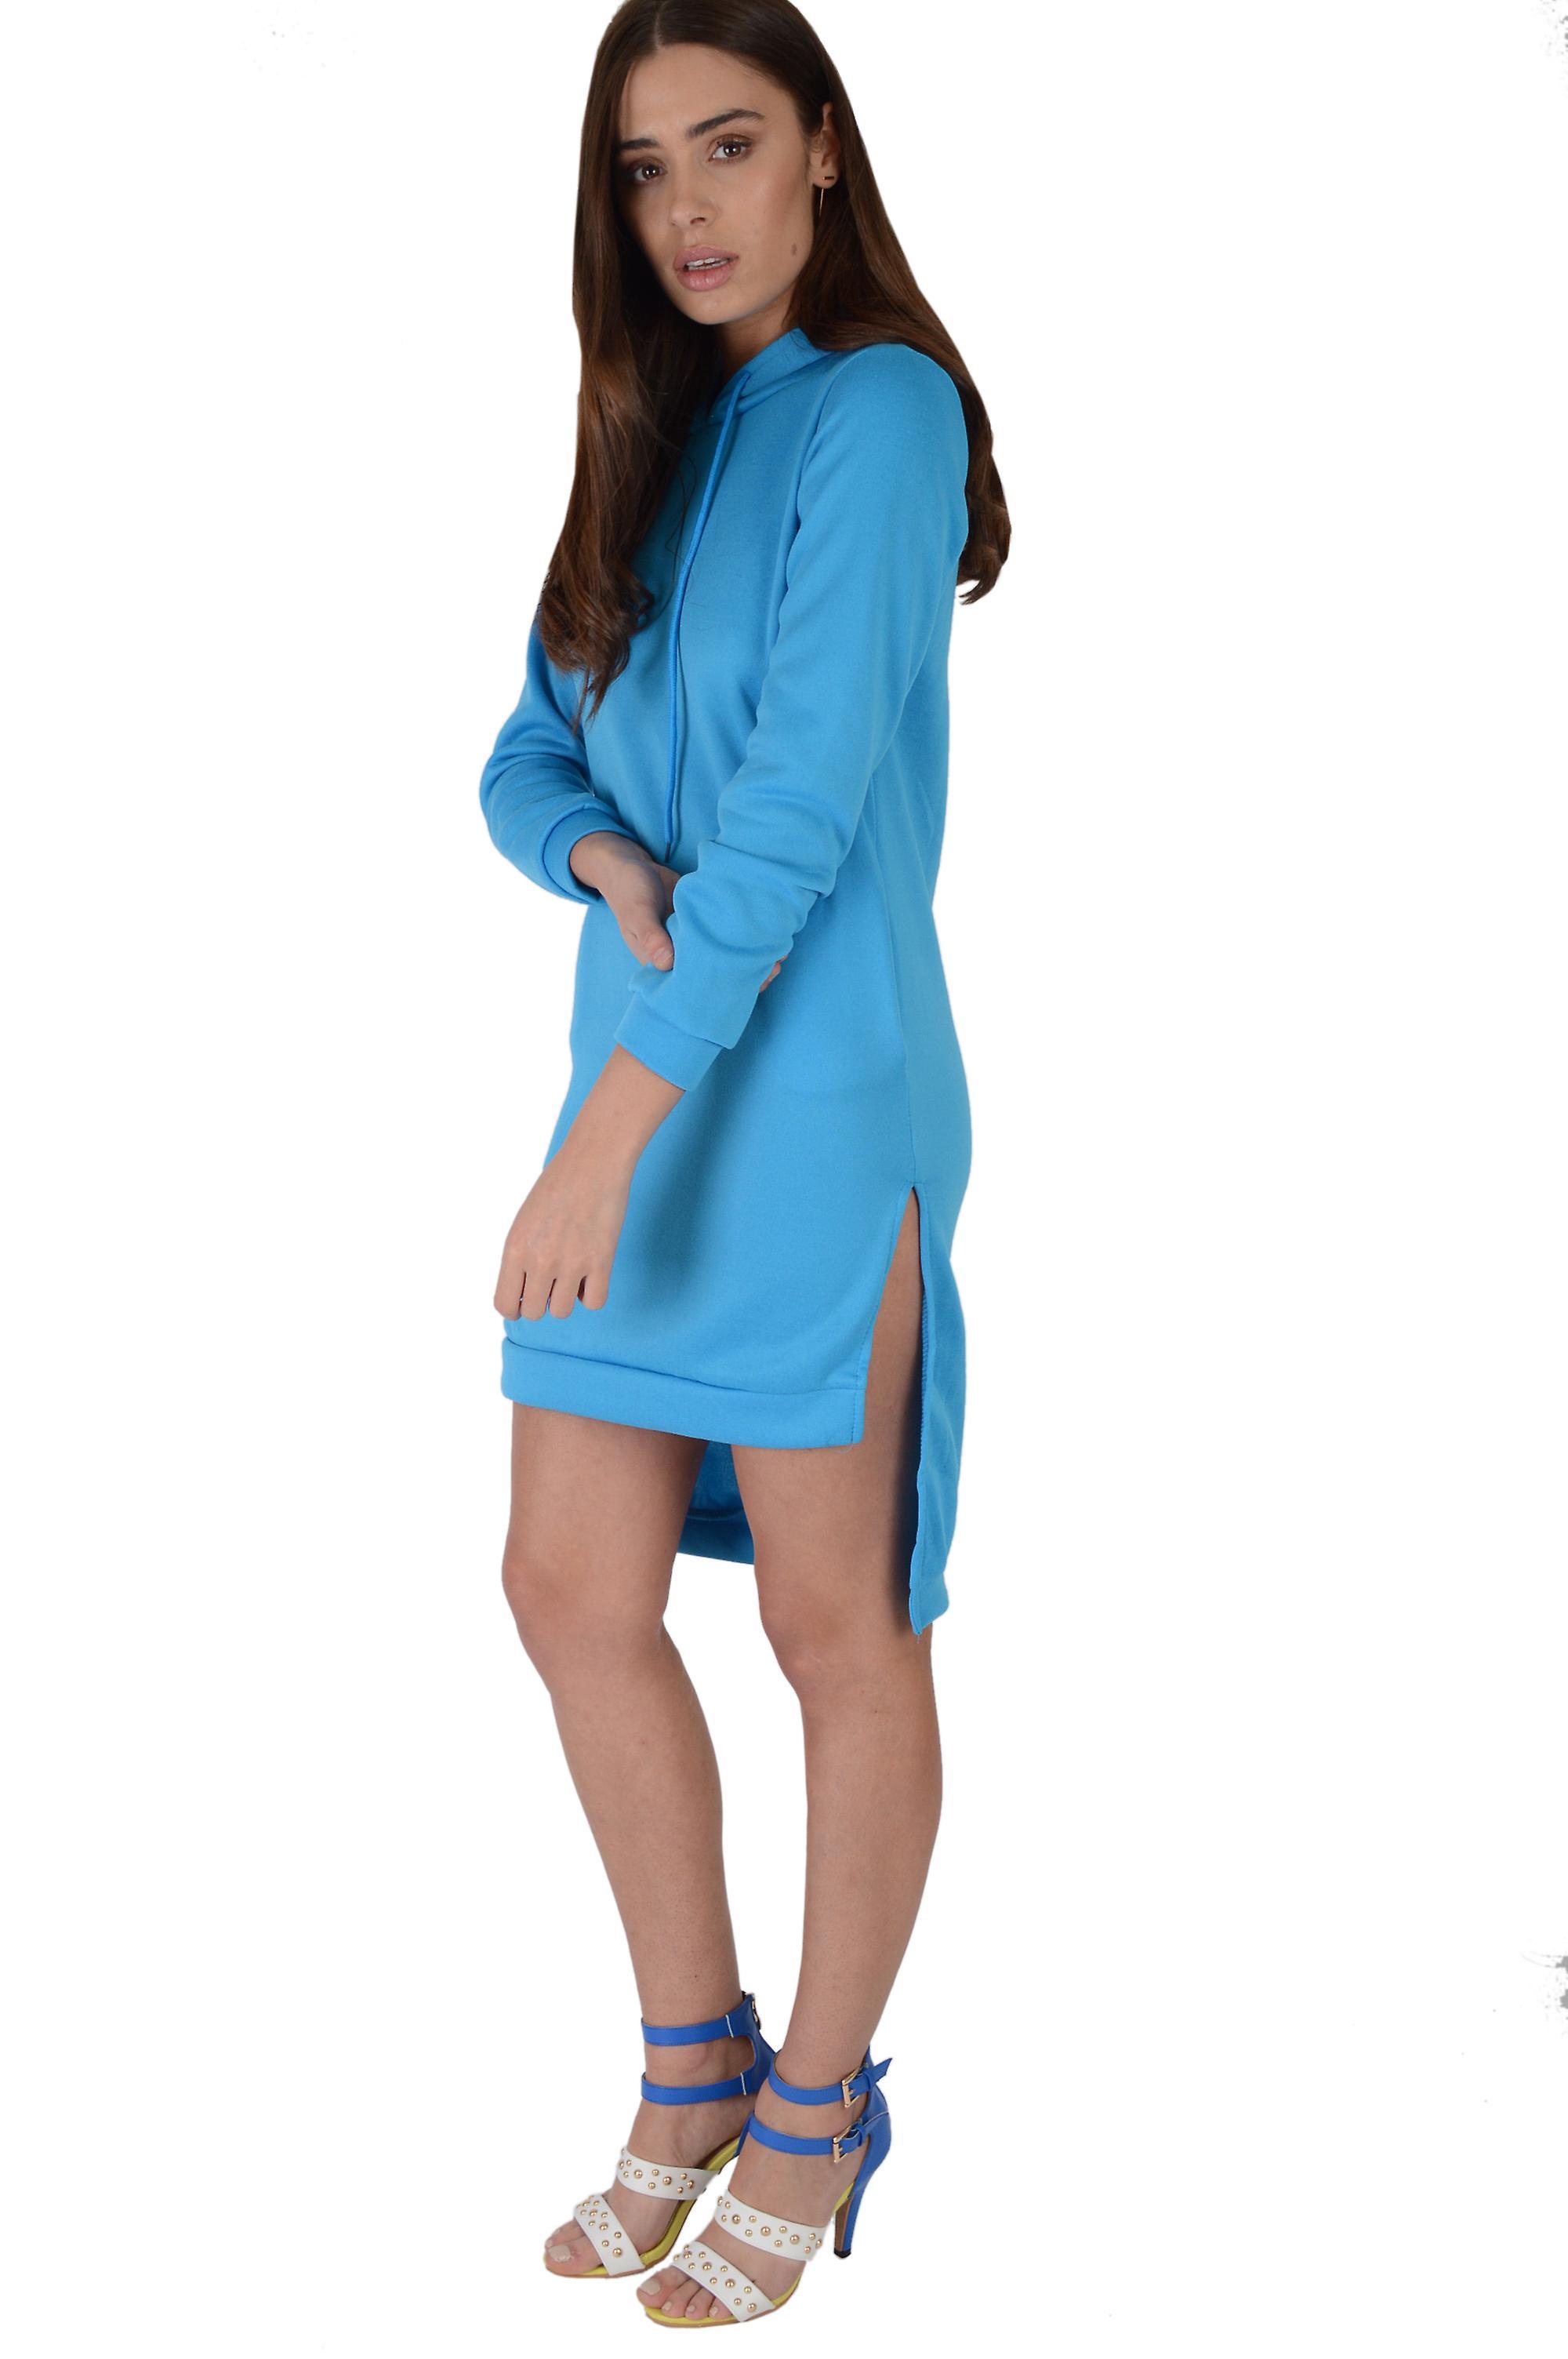 LMS Bright Blue Hooded Jumper Dress With Lower Back Hem - SAMPLE